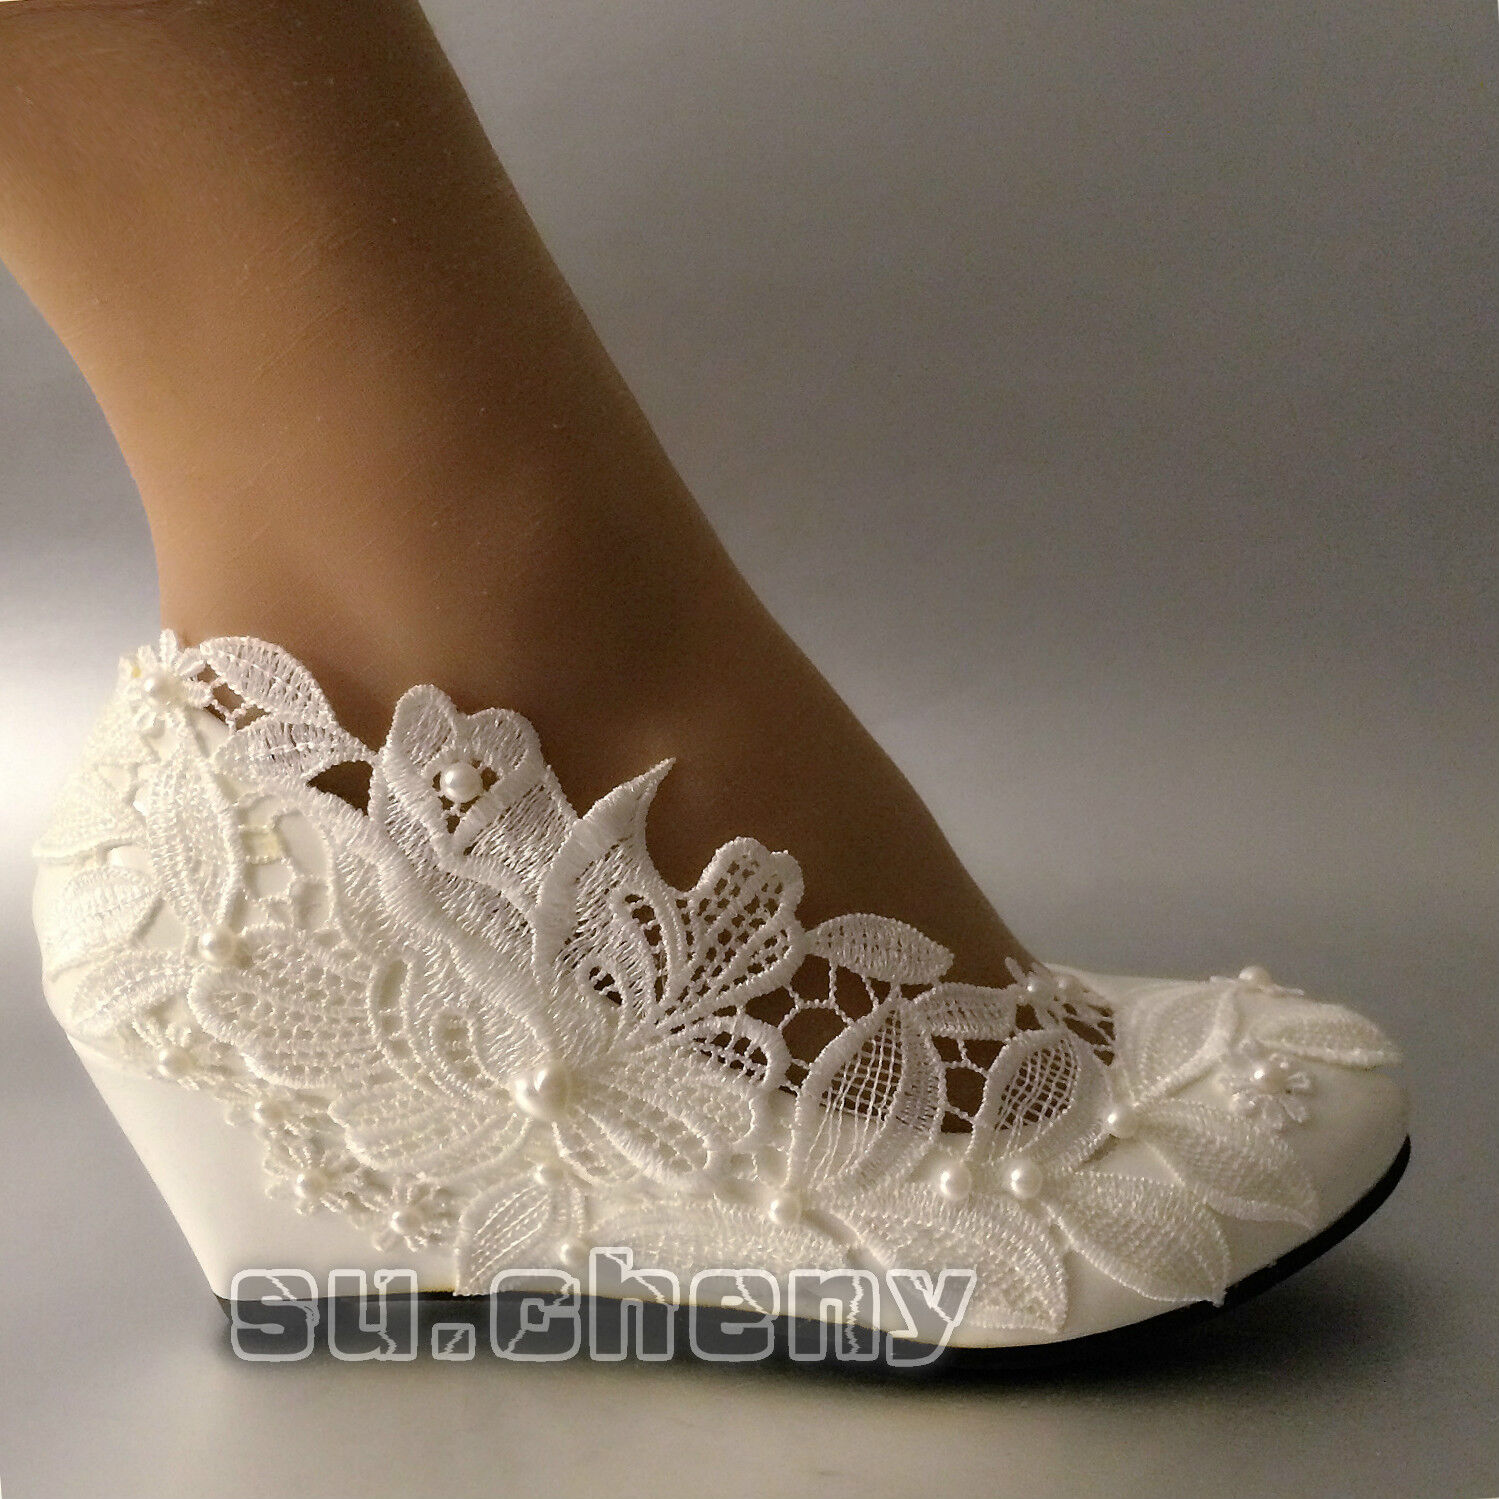 4e2983e85fa Обувь для свадьбы su.cheny White lace pearls flower wedge pumps crystal Wedding  Bridal pumps shoes - 231639849841 - купить на eBay.com (США) с доставкой в  ...